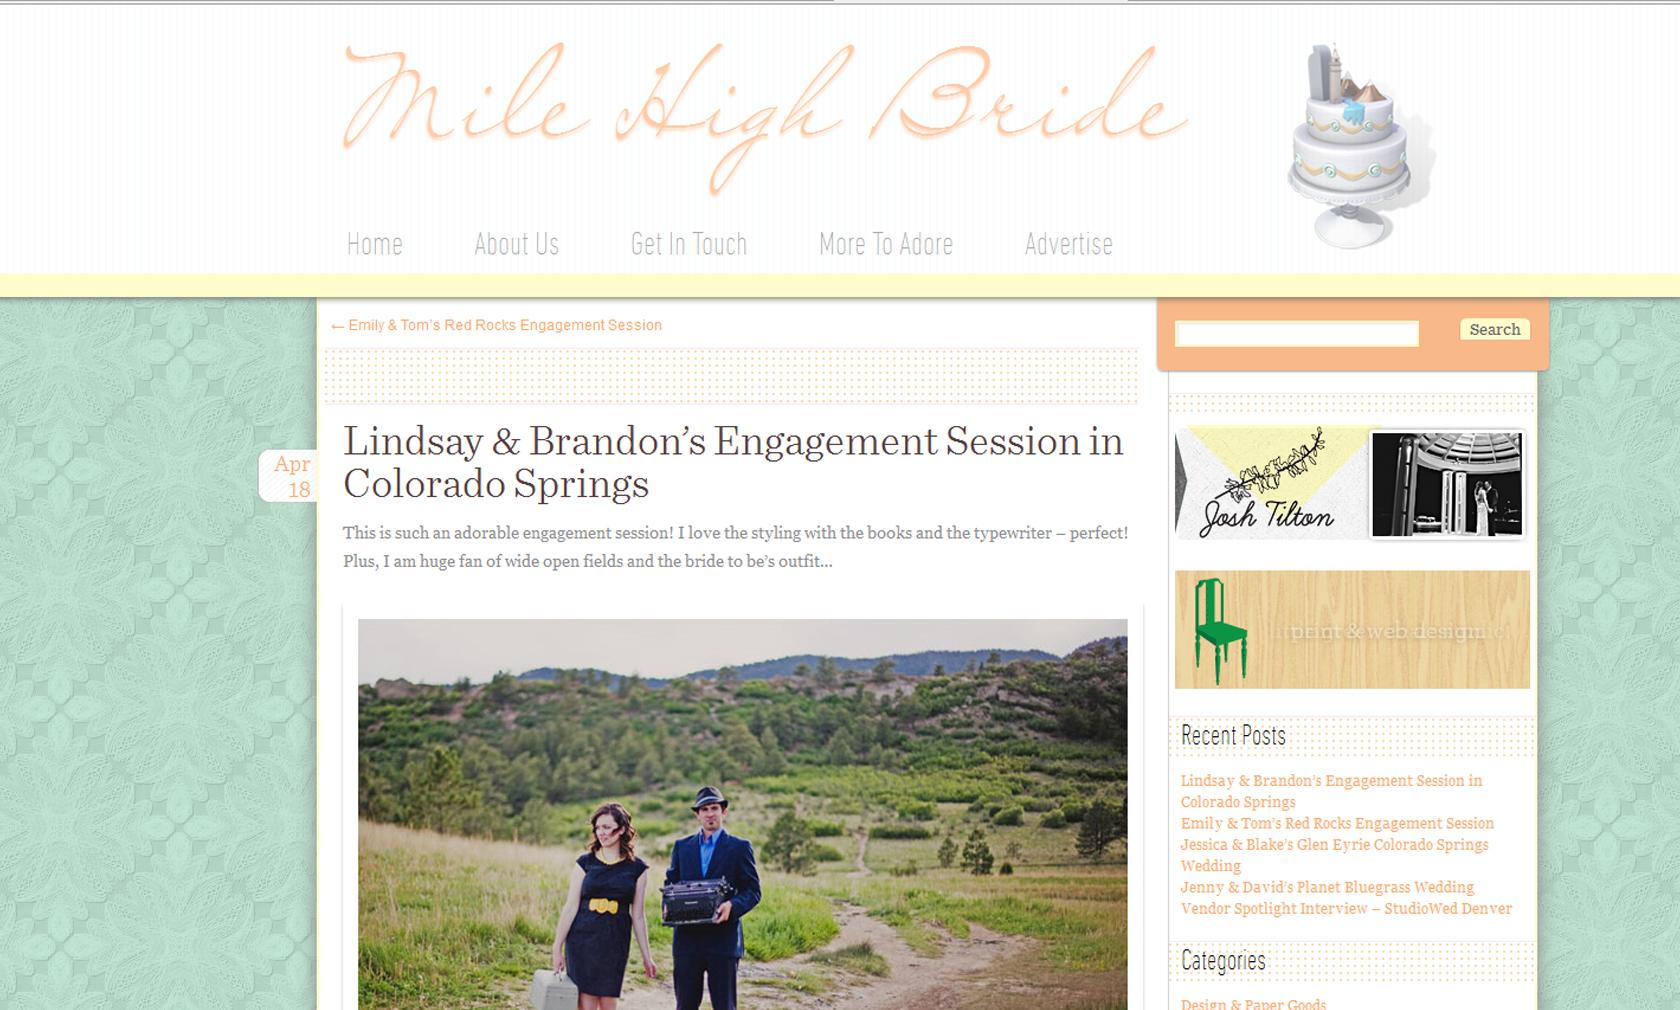 colorado springs engagement, colorado springs engagement photographer, buena vista wedding photographer, seattle wedding photographer